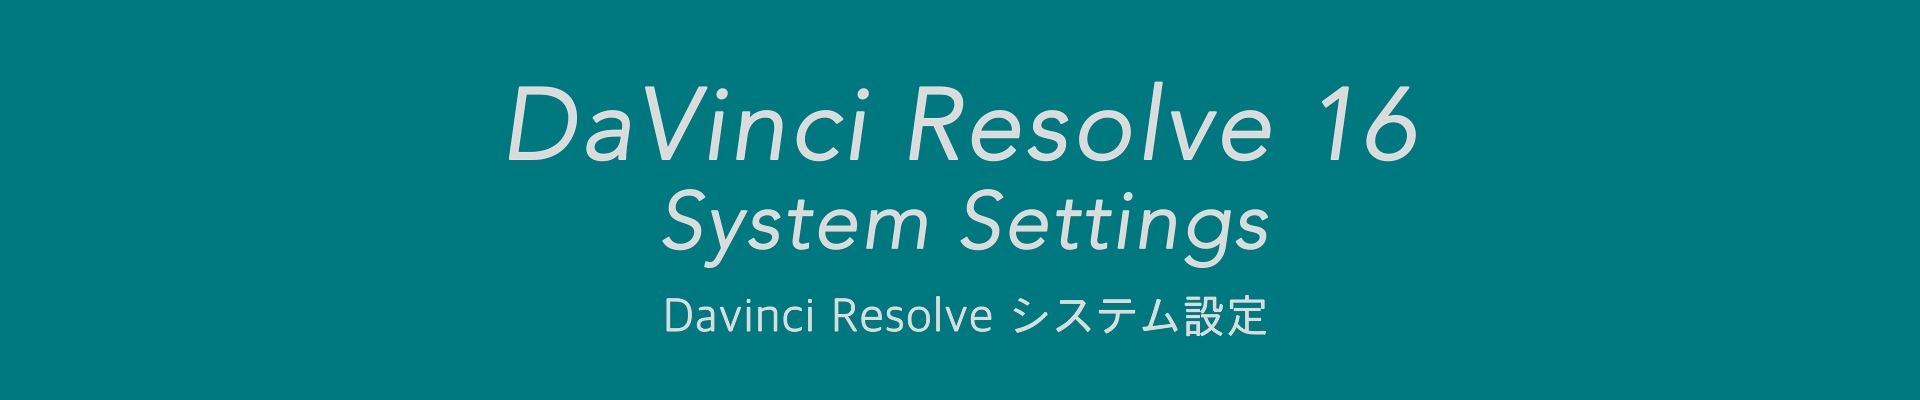 DaVinci Resolve 16 システム設定